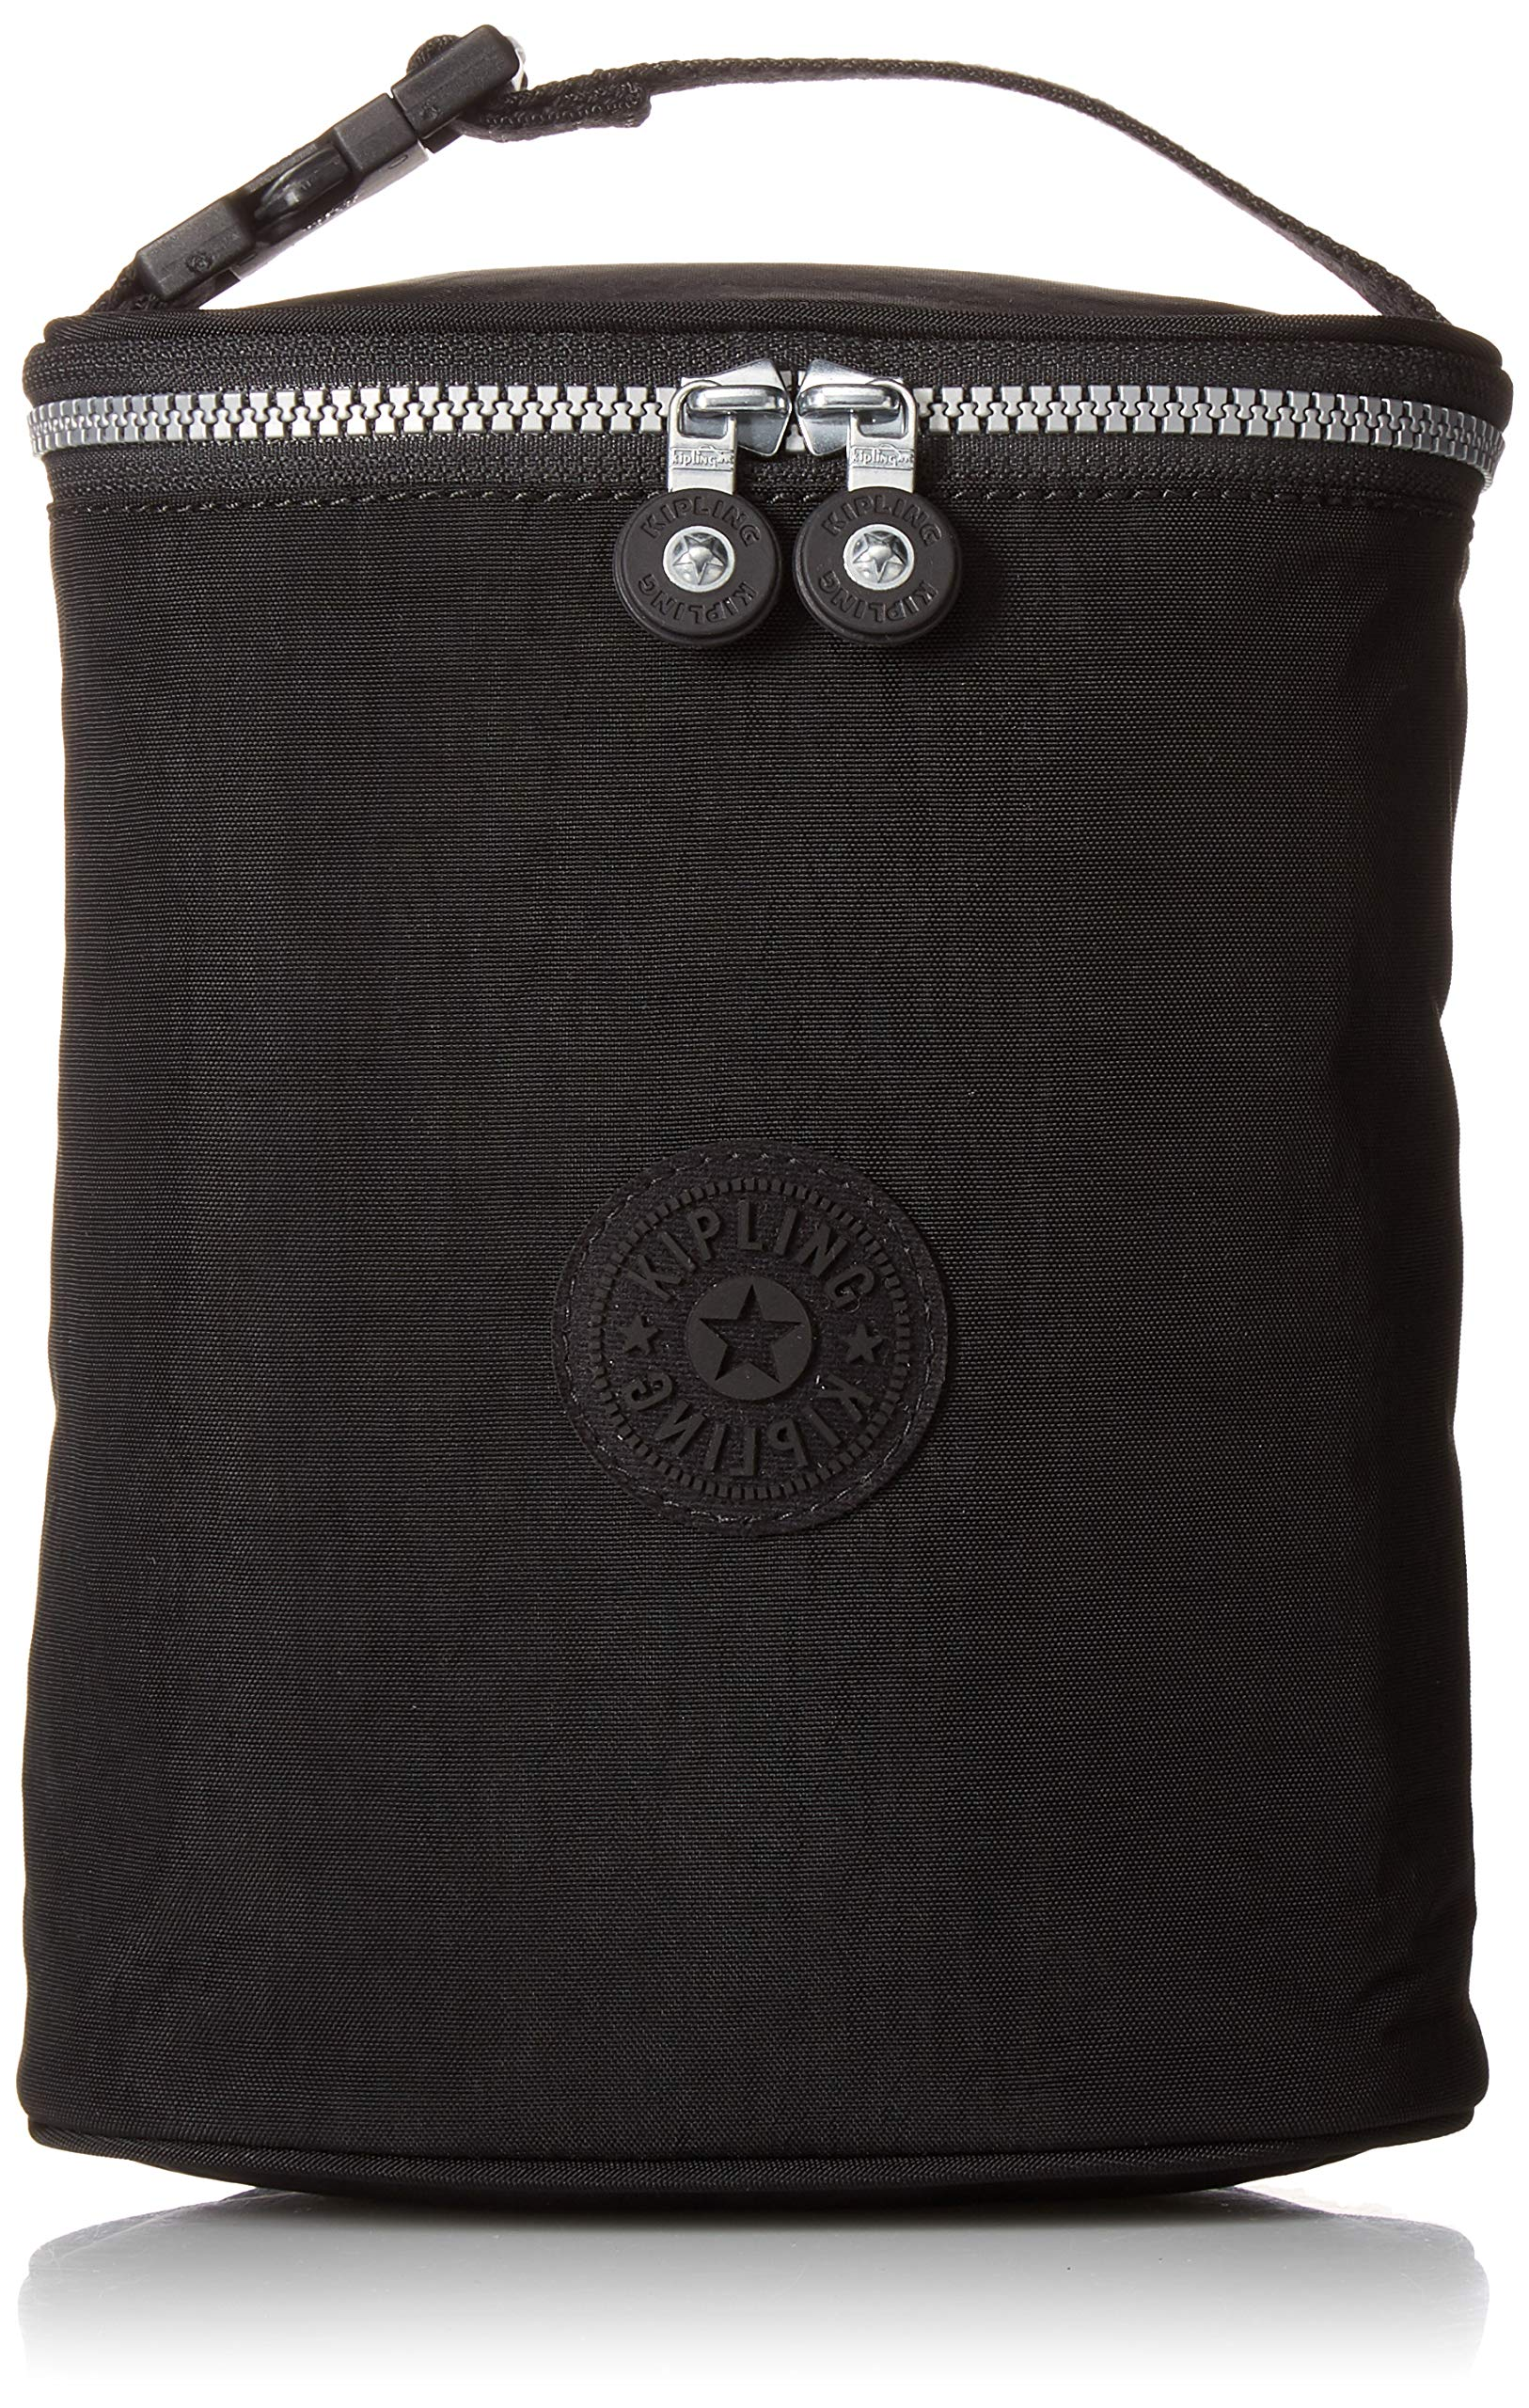 Kipling Insulated Baby Bottle Holder, Clip on Strap, Black